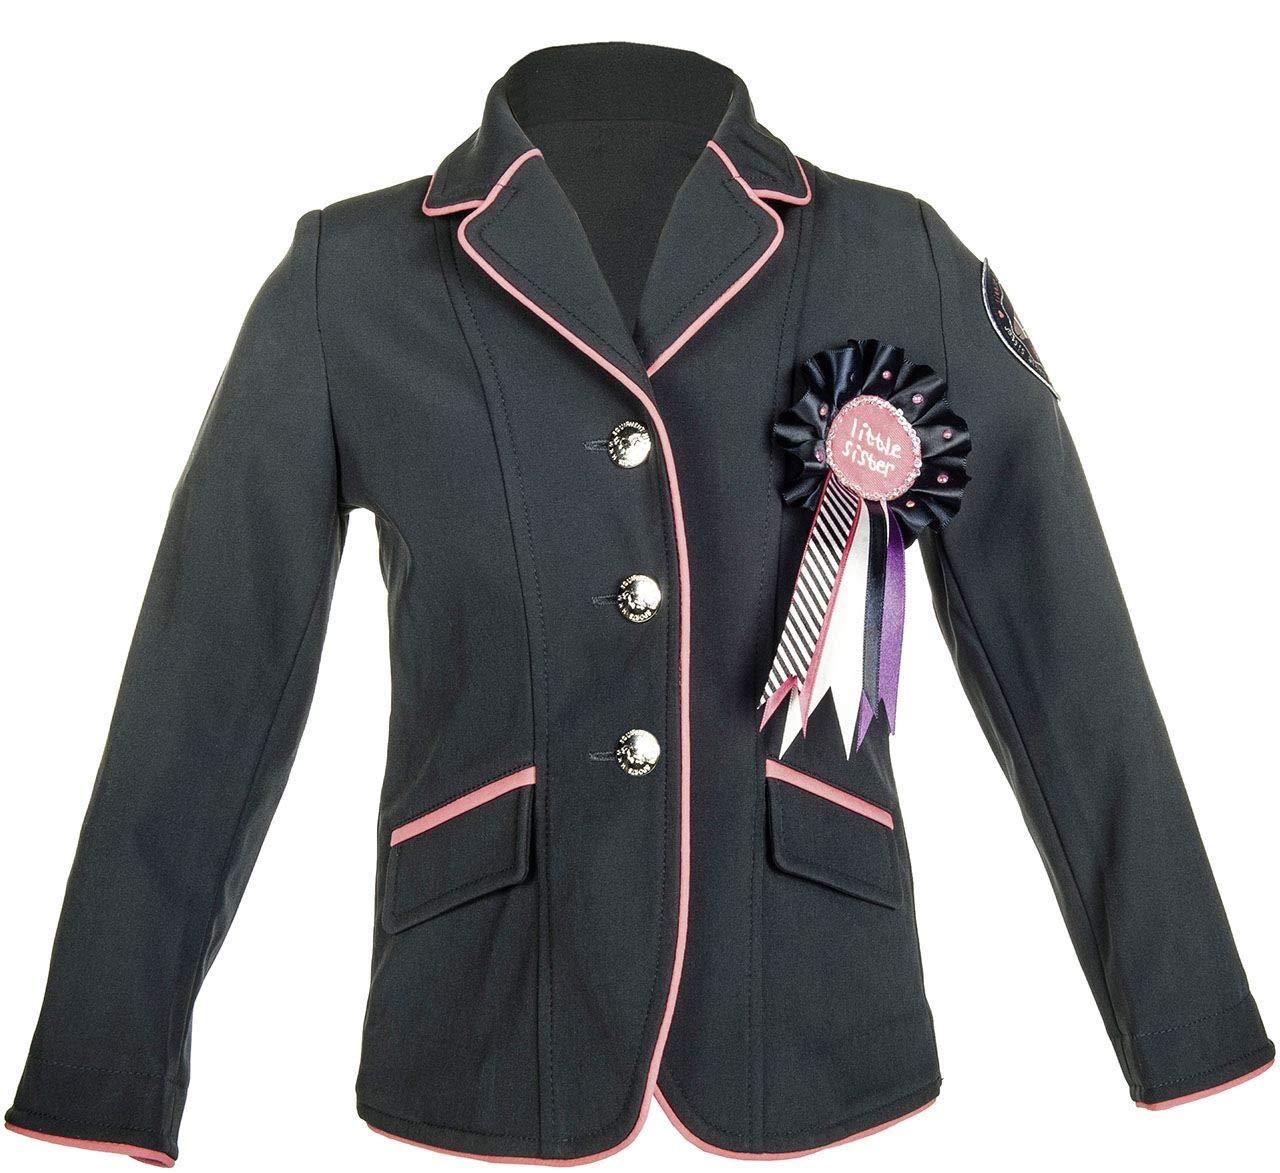 HKM Equitazione Blazer–Champ - Little sister by HKM